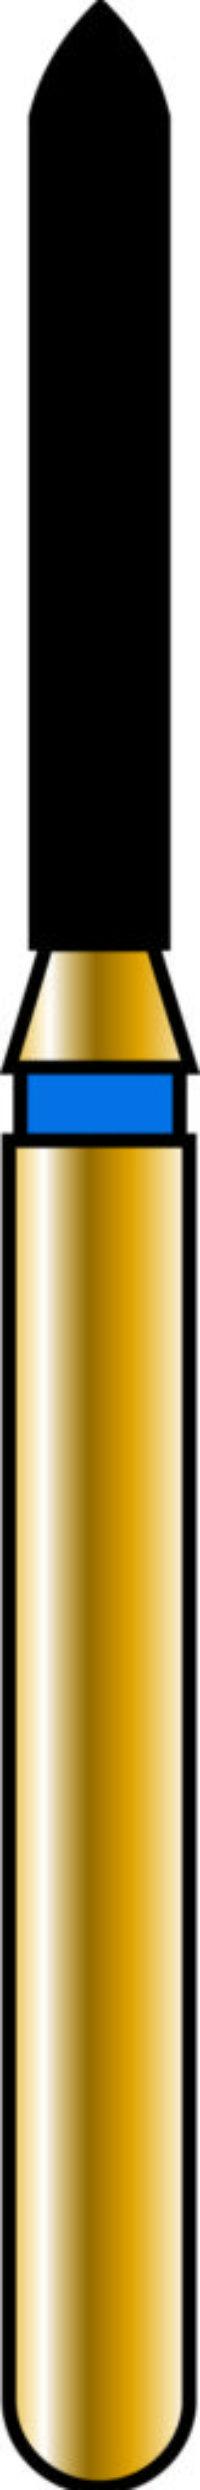 Pointed Cylinder 12-8mm Gold Diamond Bur